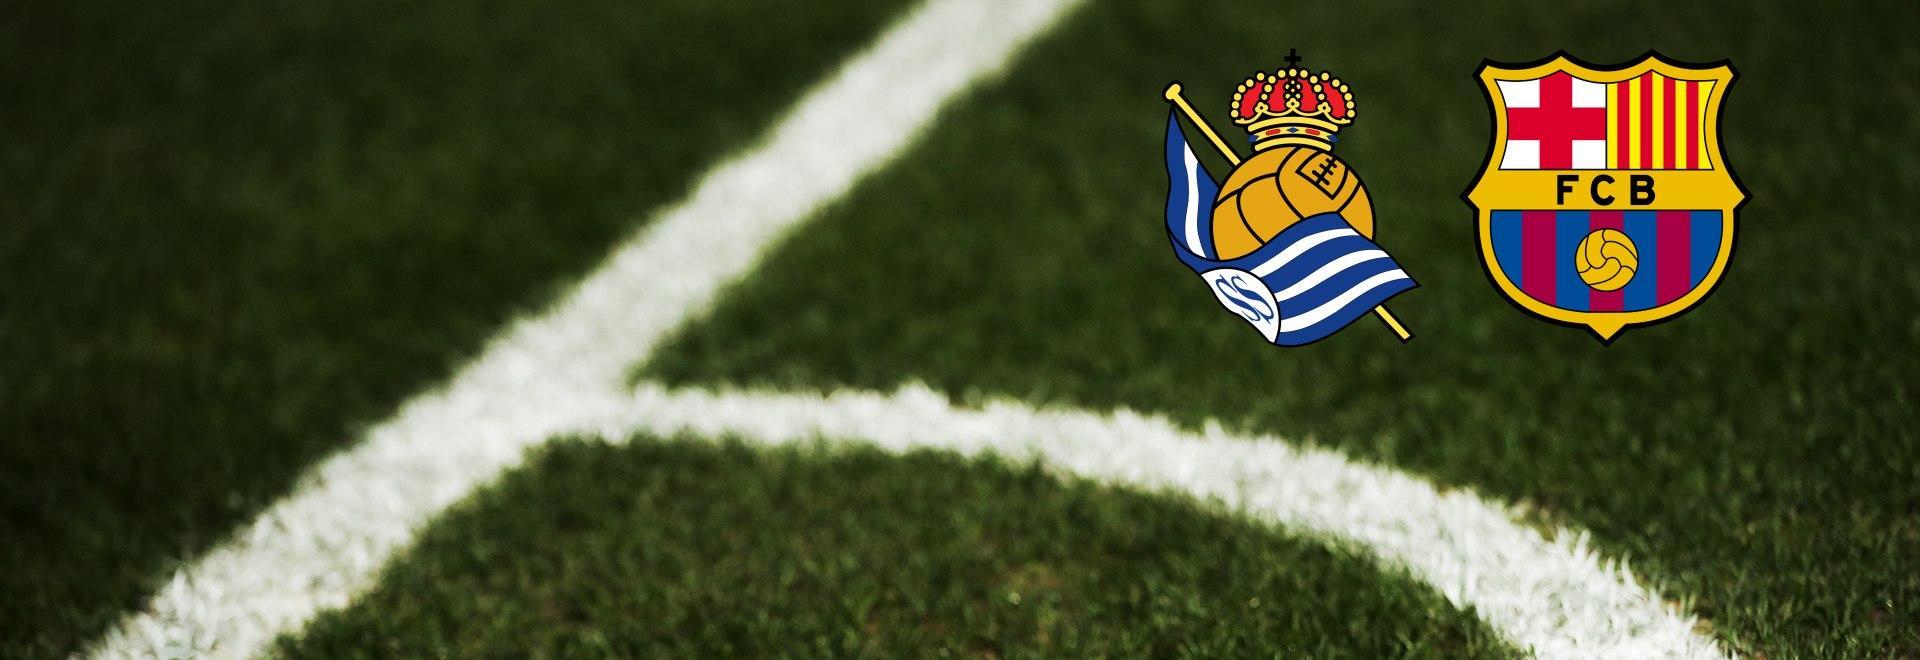 Real Sociedad - Barcellona. 17a g.